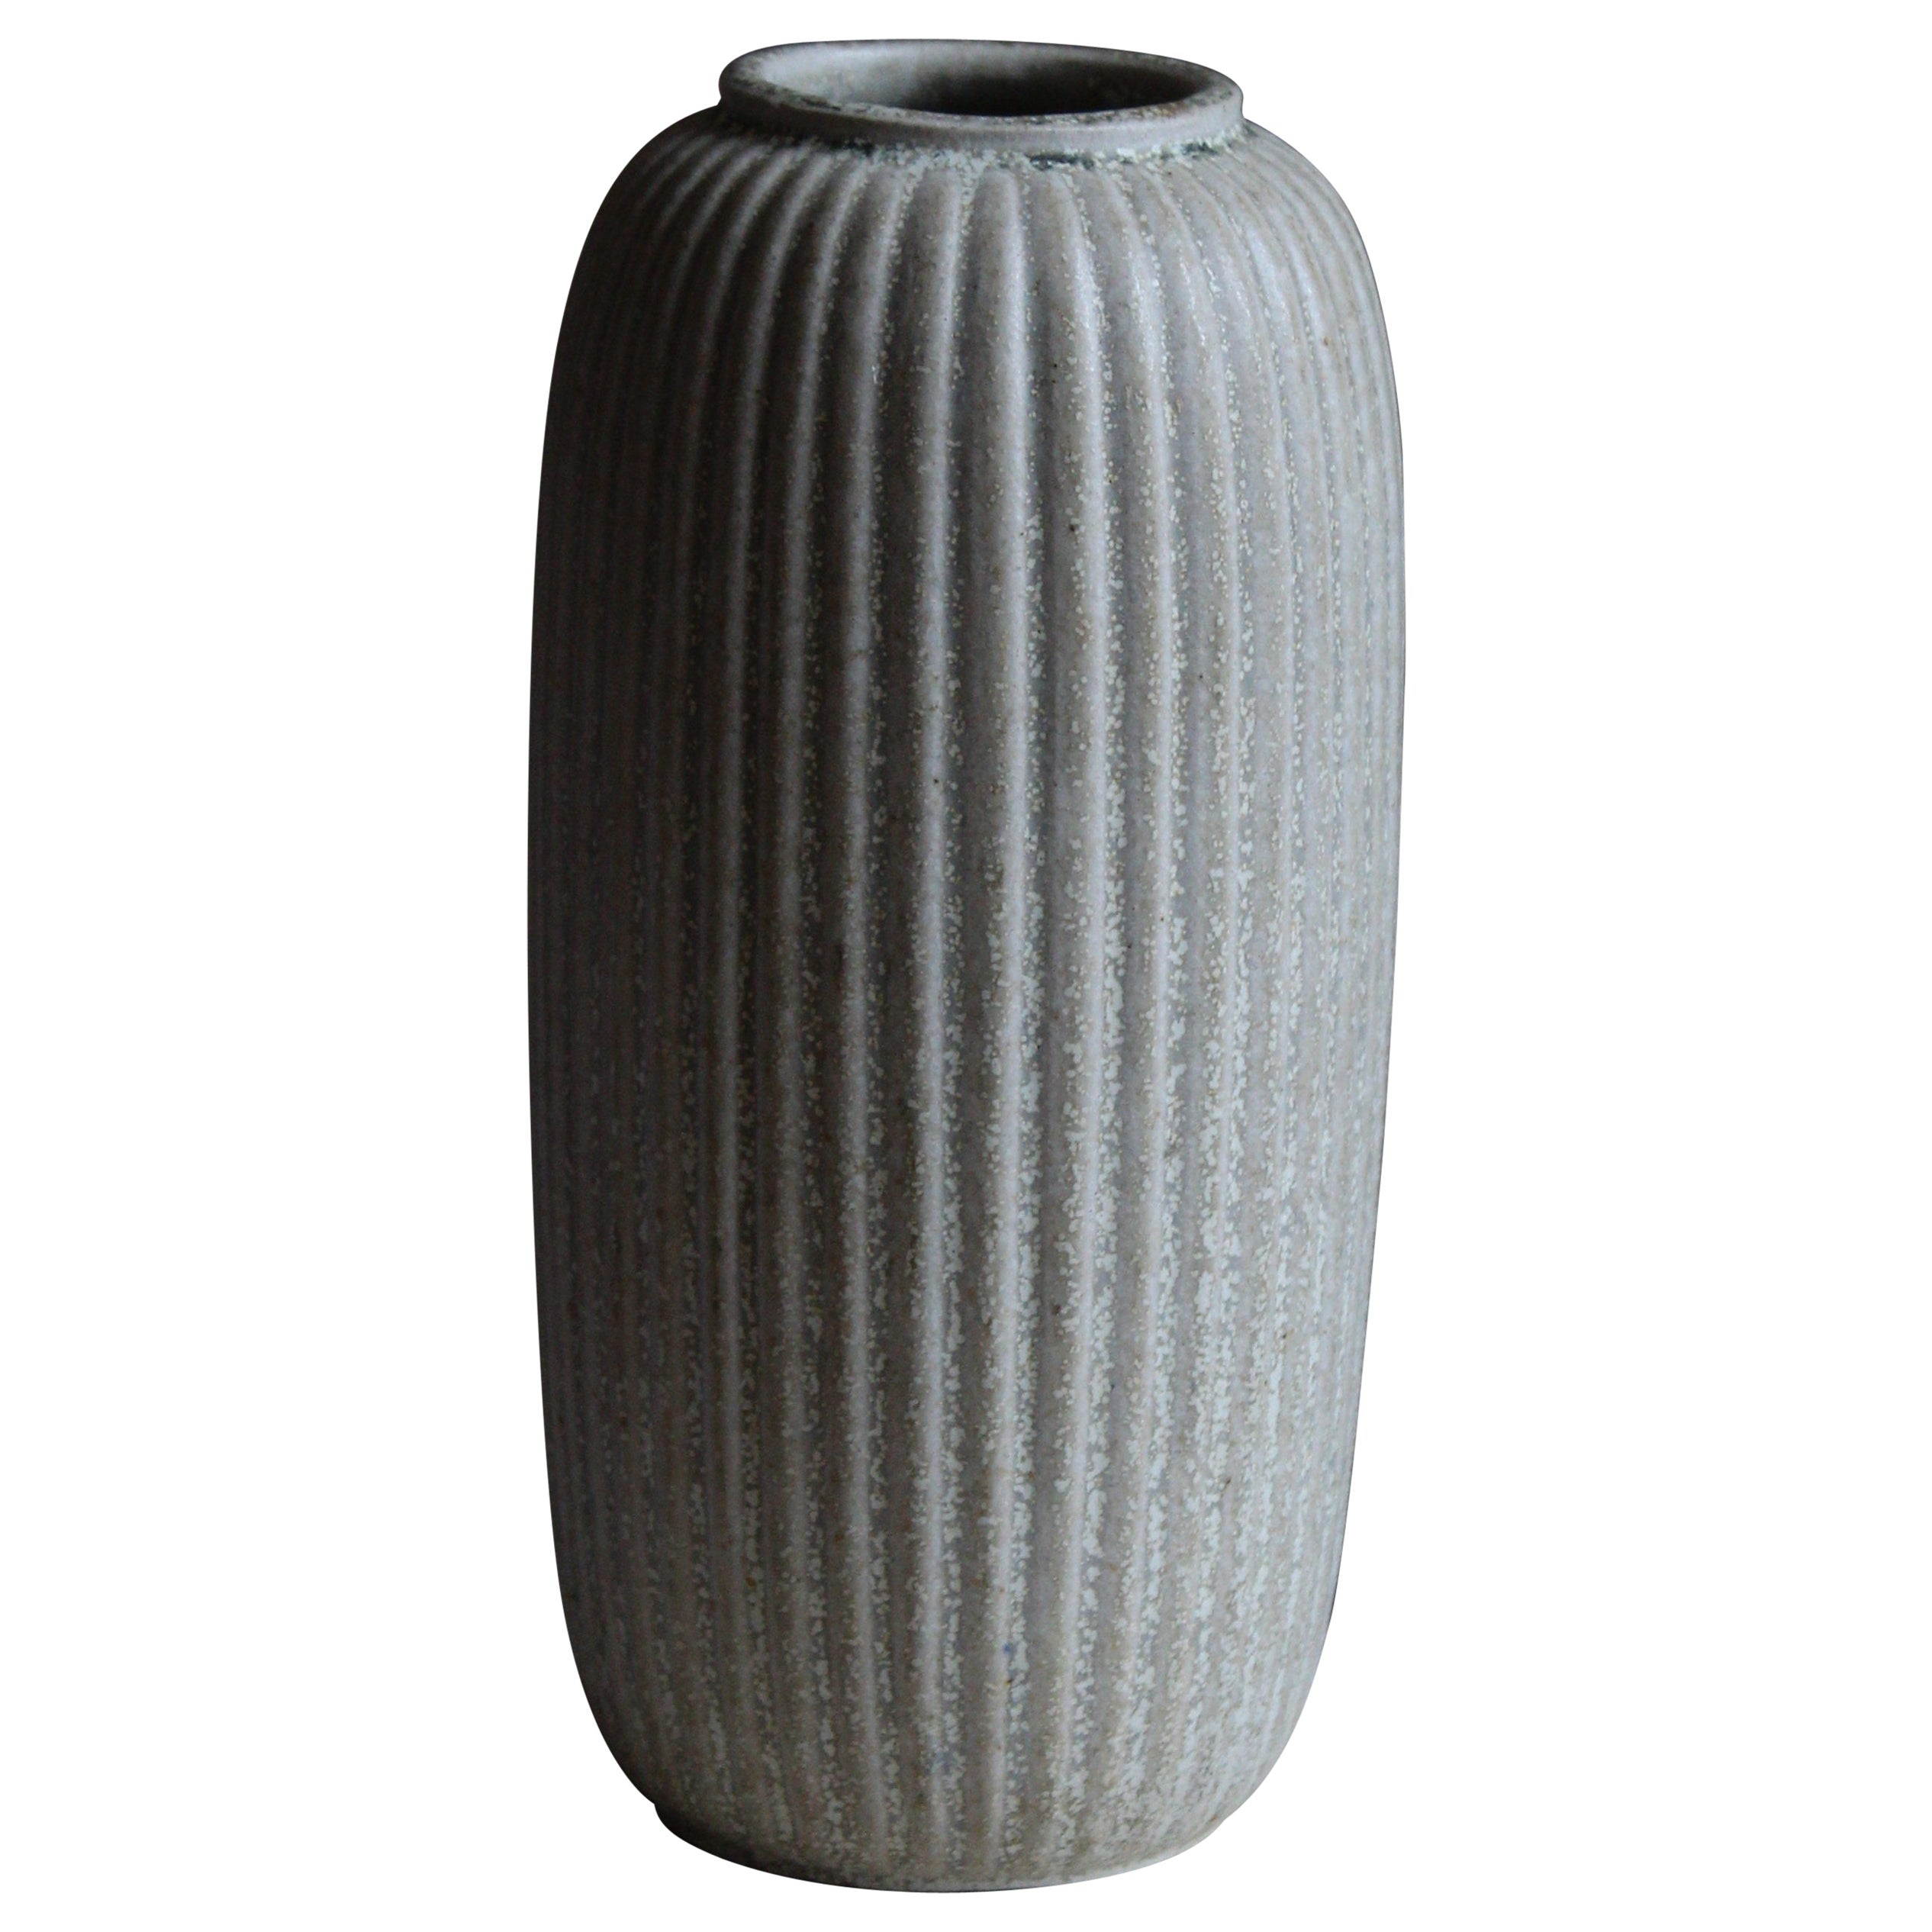 Arne Bang, Sizable Vase, Grey Glazed Stoneware, Studio, Denmark, c. 1927